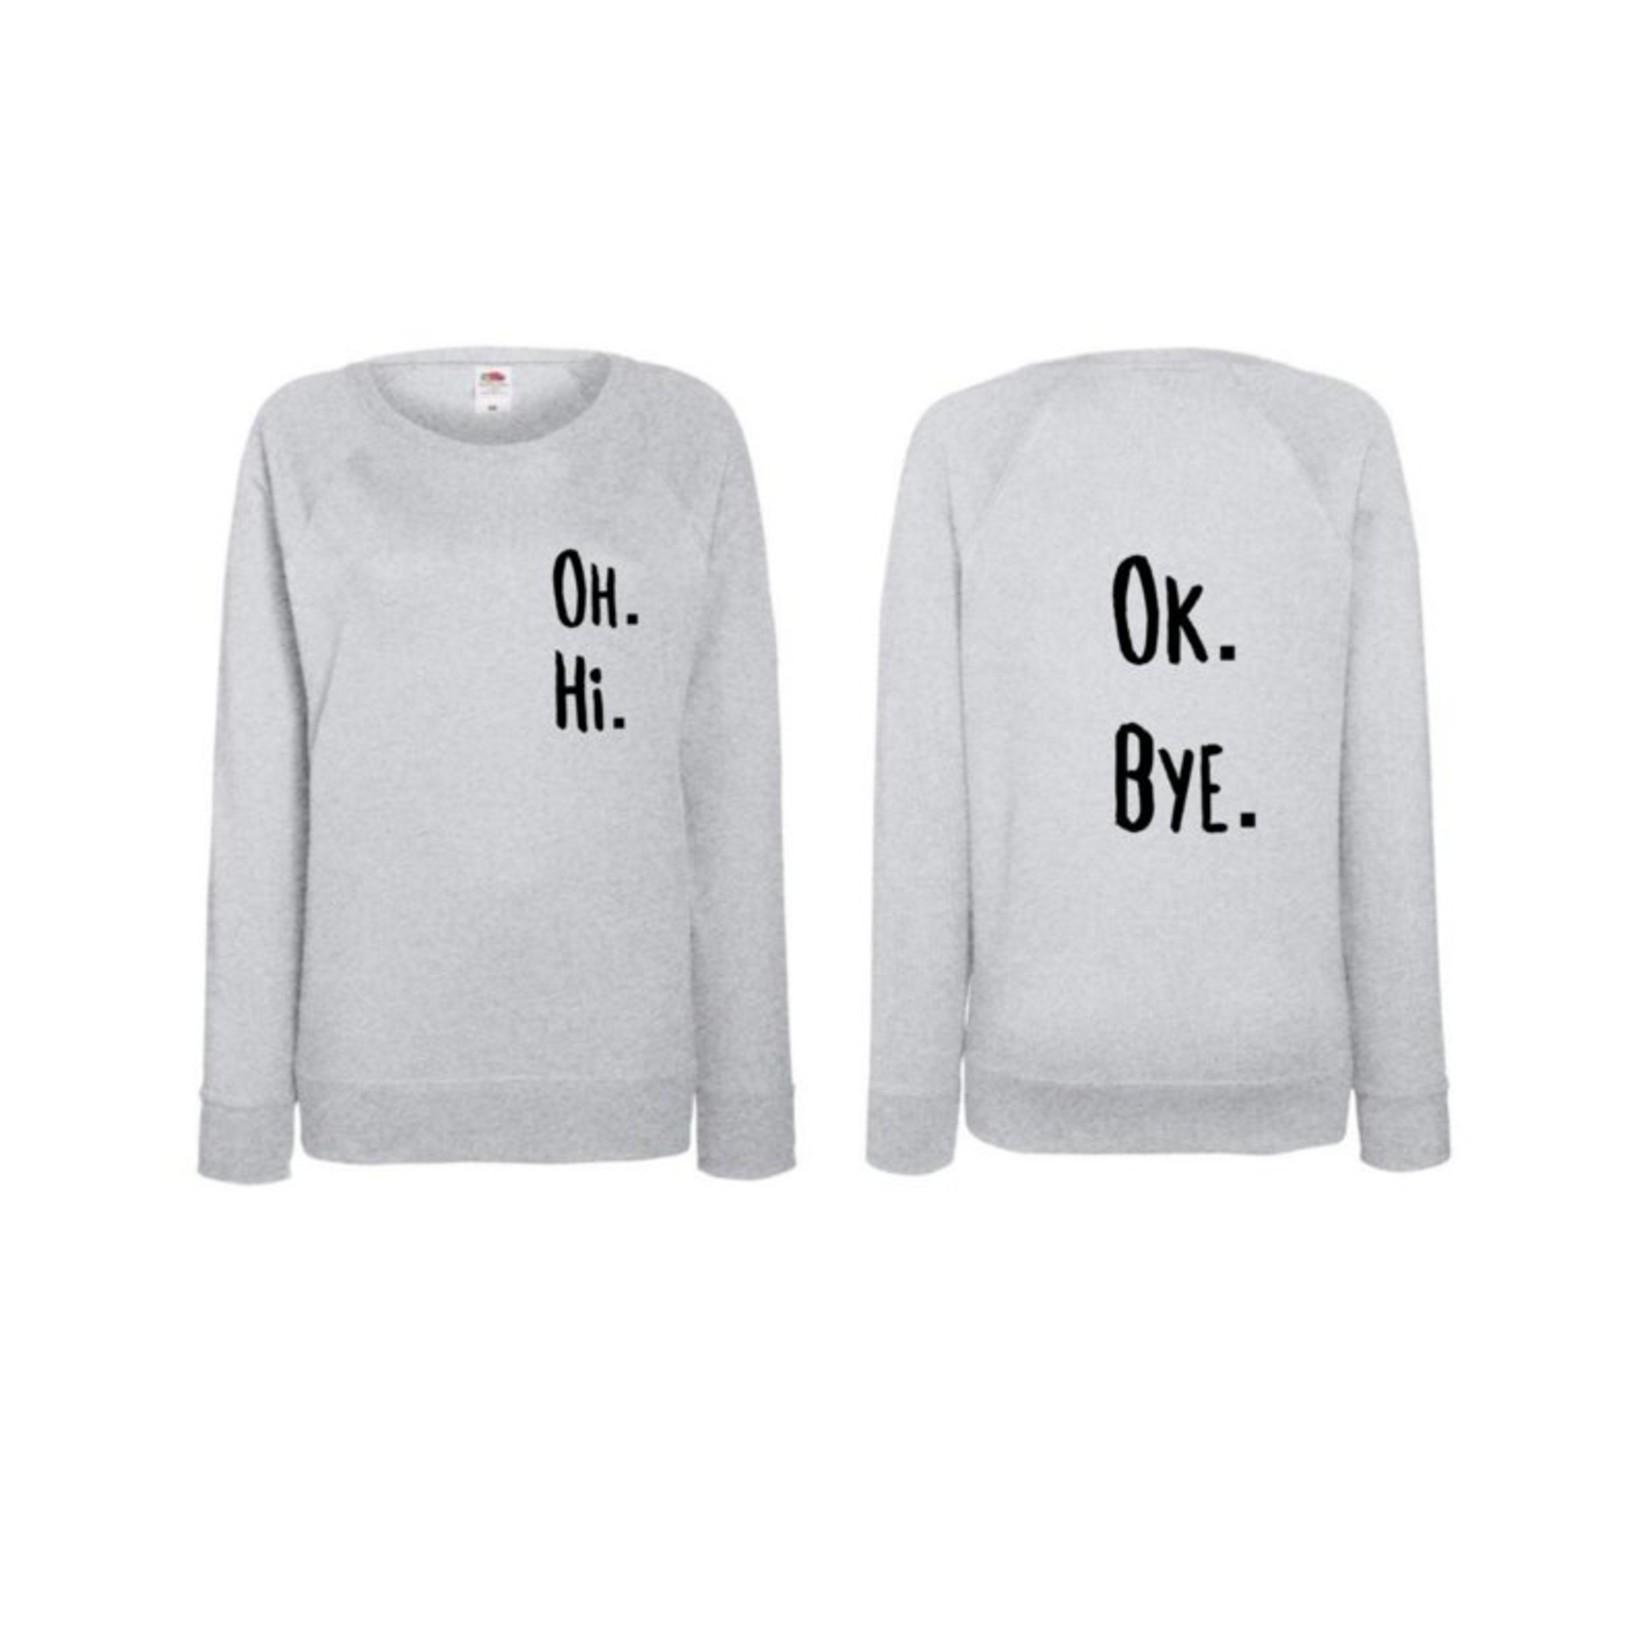 Perf not so Perf Sweater ok bye.